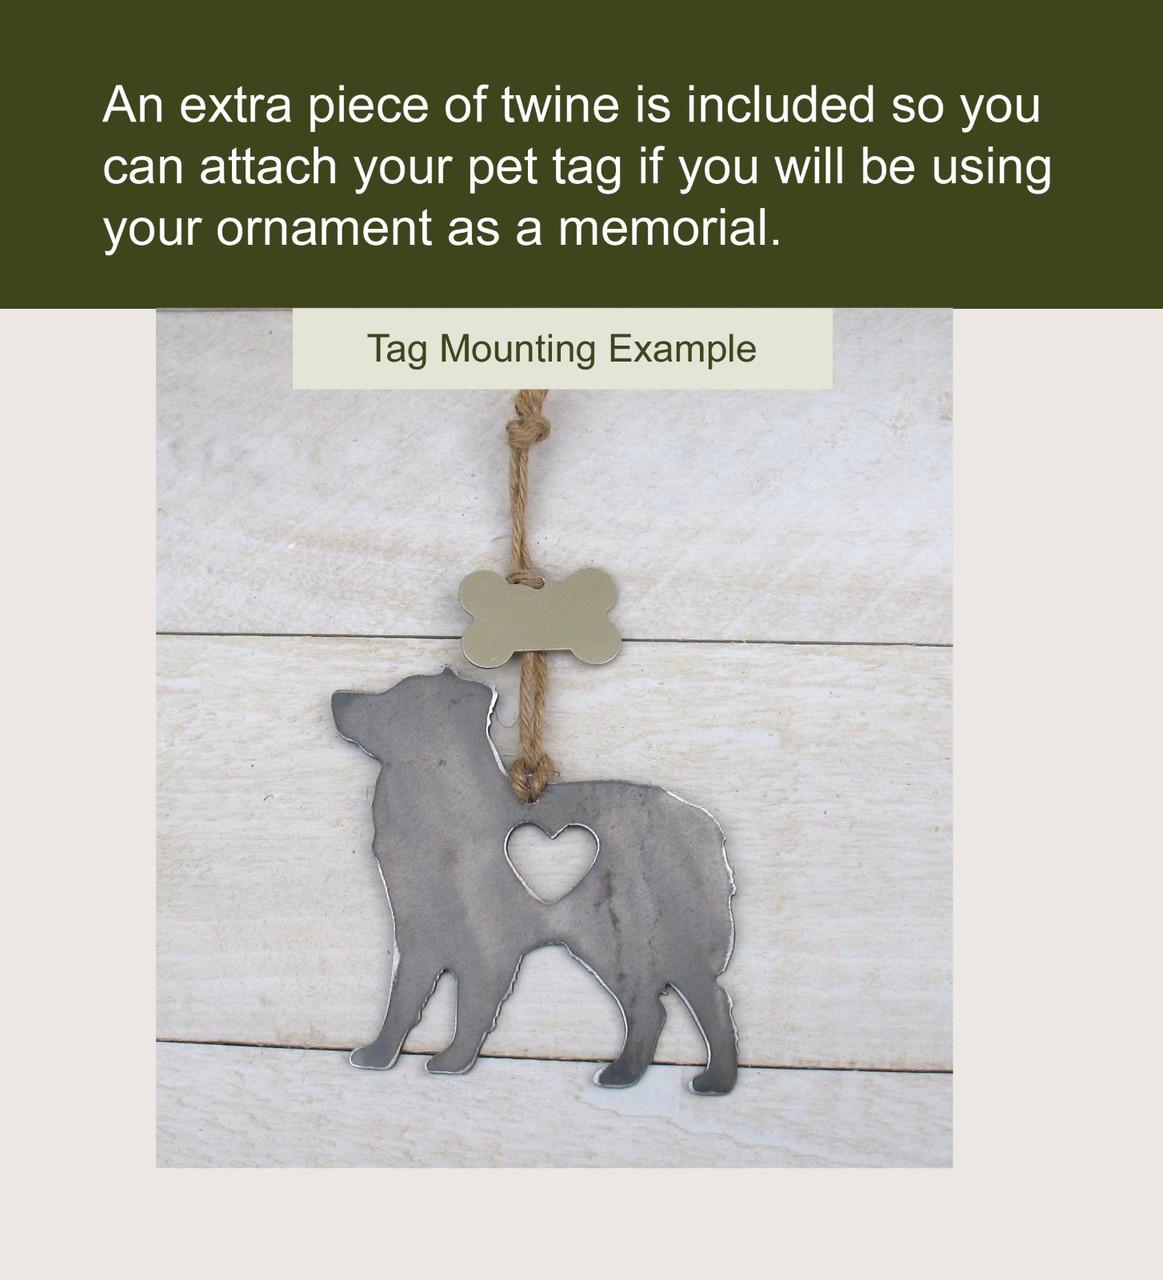 Samoyed Dog Ornament - Metal Dog Christmas Ornament - Pet Lover Memorial Ornament - Pet Loss Dog Memorial Ornament Remembrance Gift